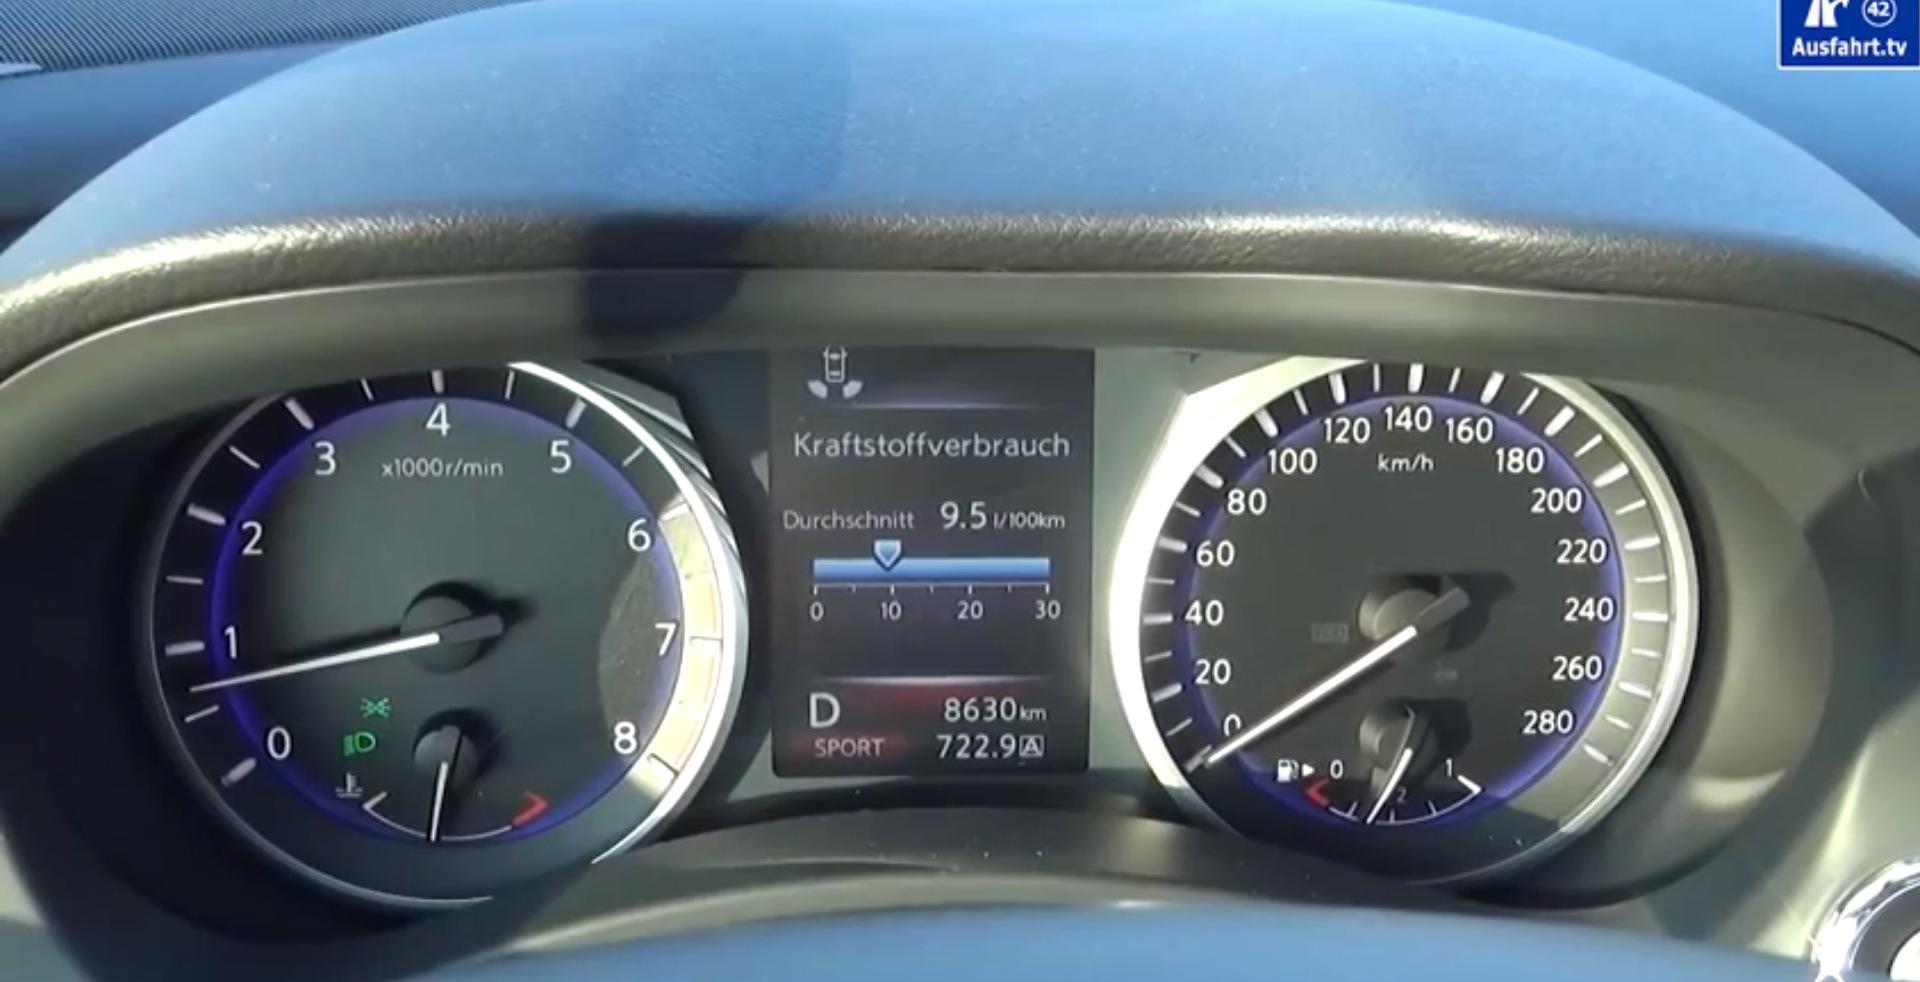 Infiniti q50 2 0t acceleration test 0 to 100 km h decent sounding engine